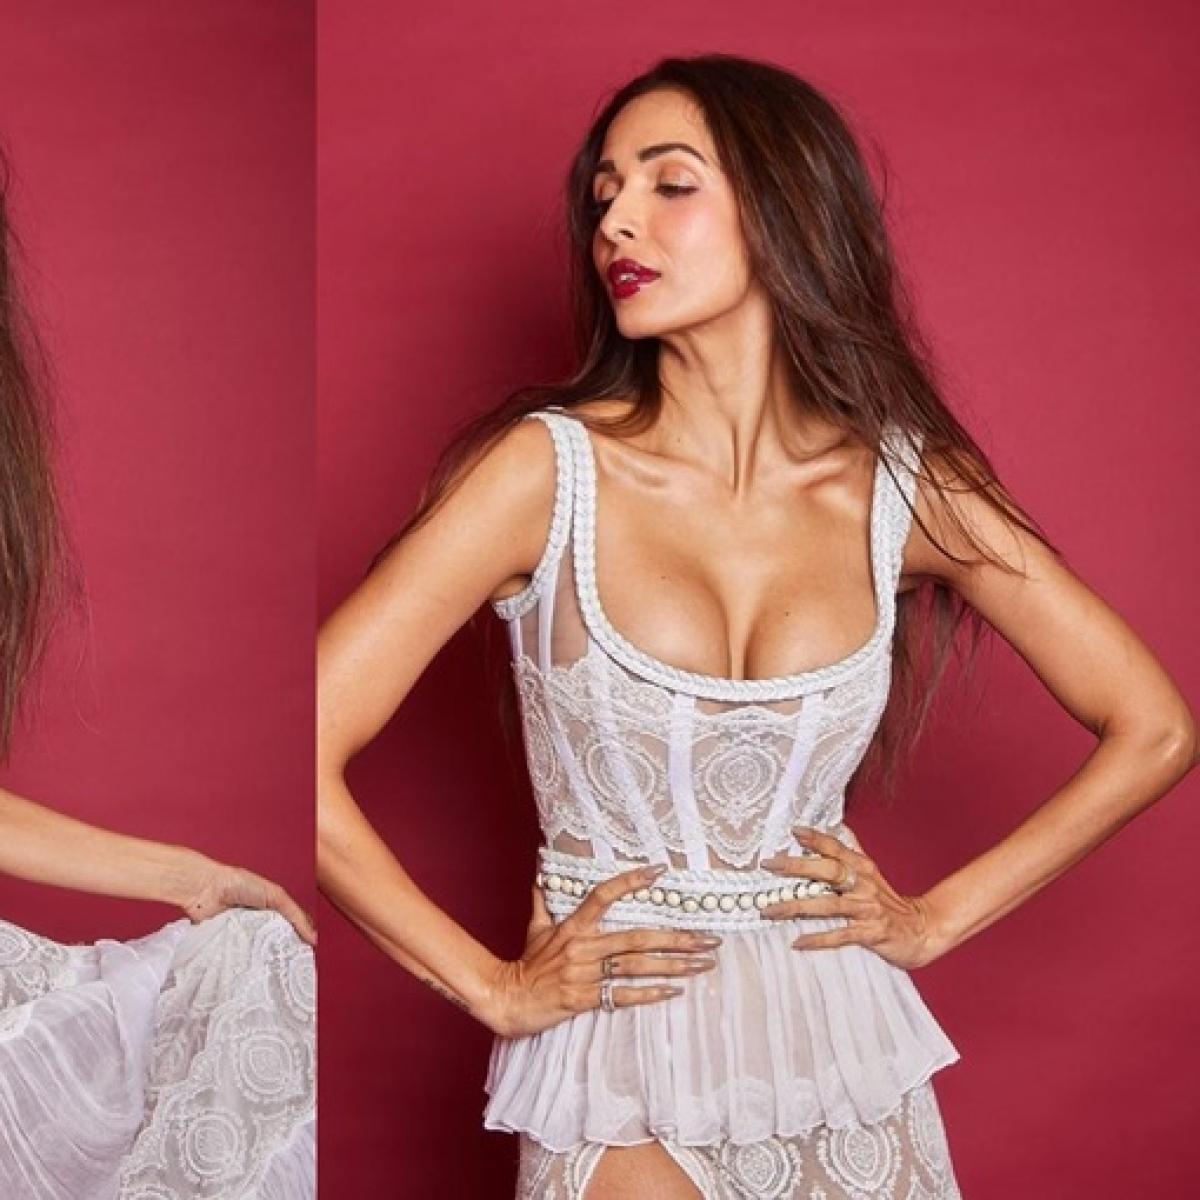 Malaika Arora's revealing dress grabs Arjun Kapoor's attention